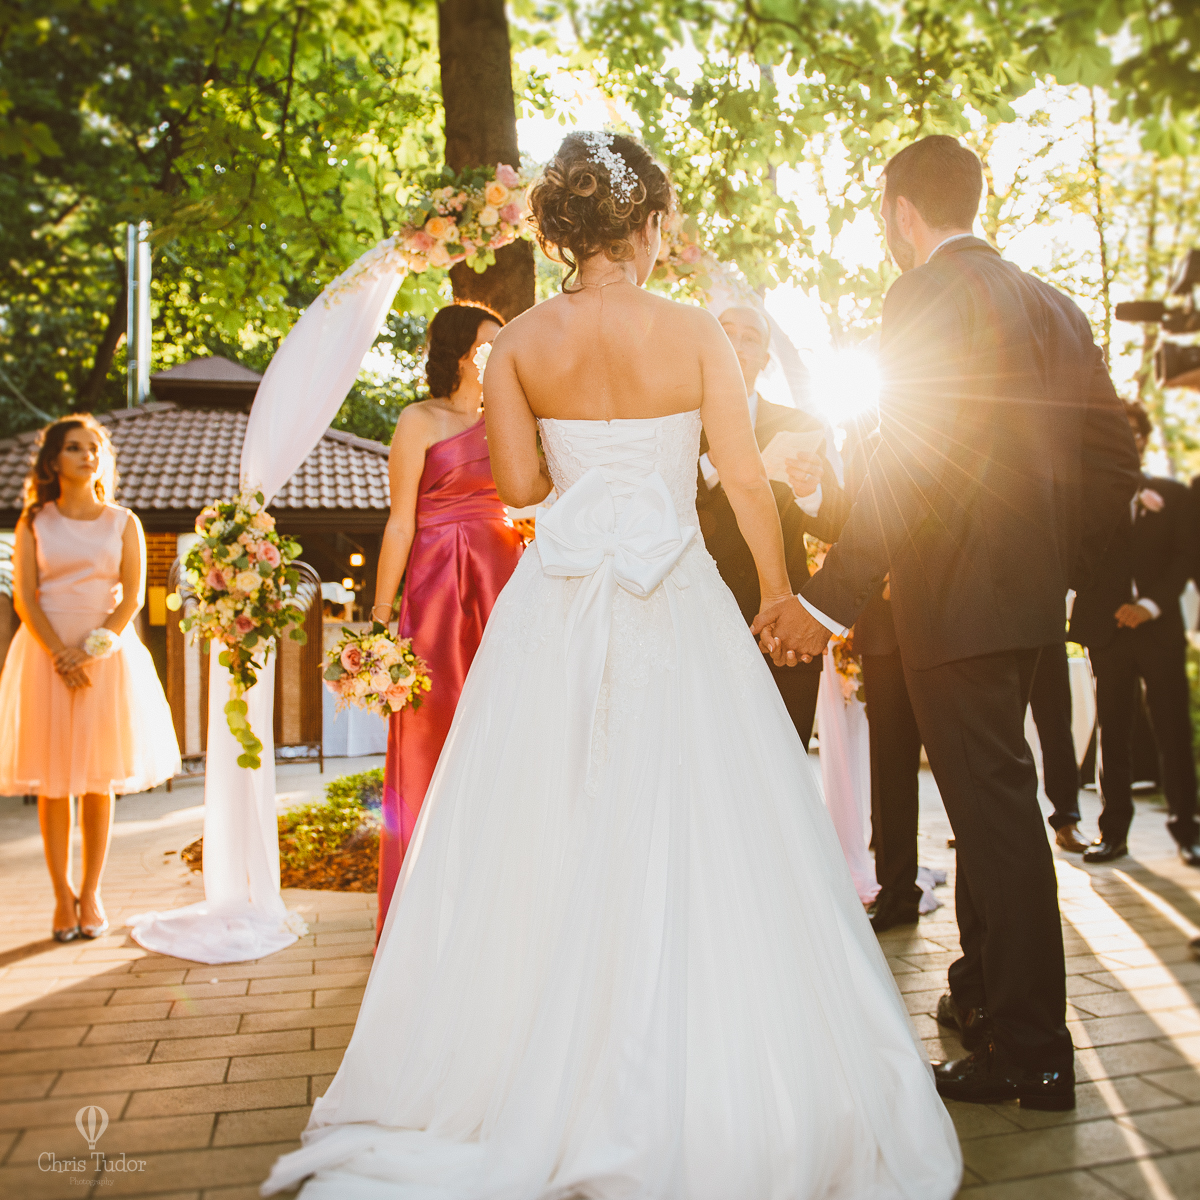 e-i-hochzeit-wedding-10.jpg